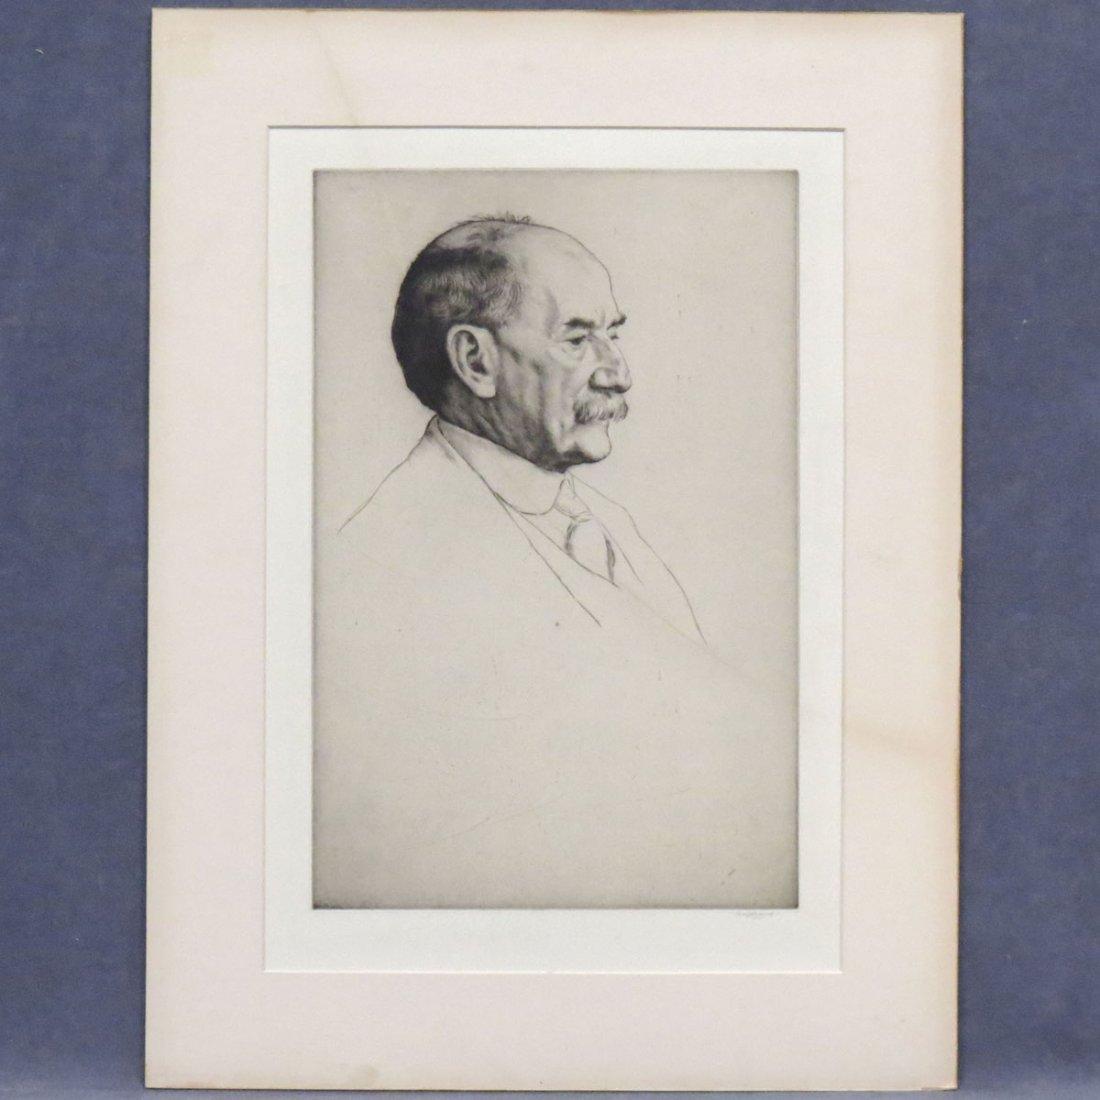 WILLIAM STRANG (BRITISH 1859-1921) ETCHING